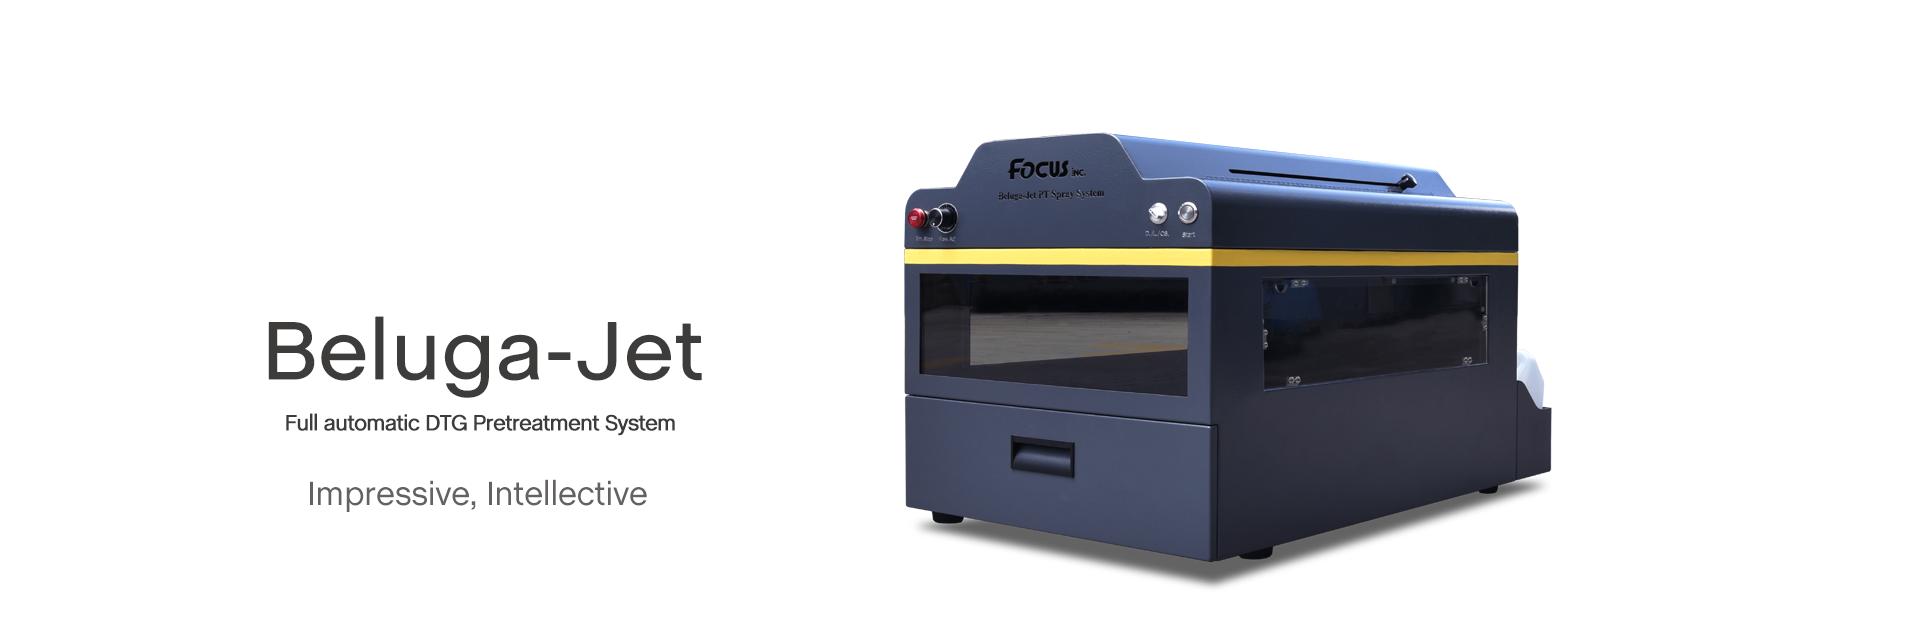 Focus Inc. Pretreatment printers for  T shirt printing